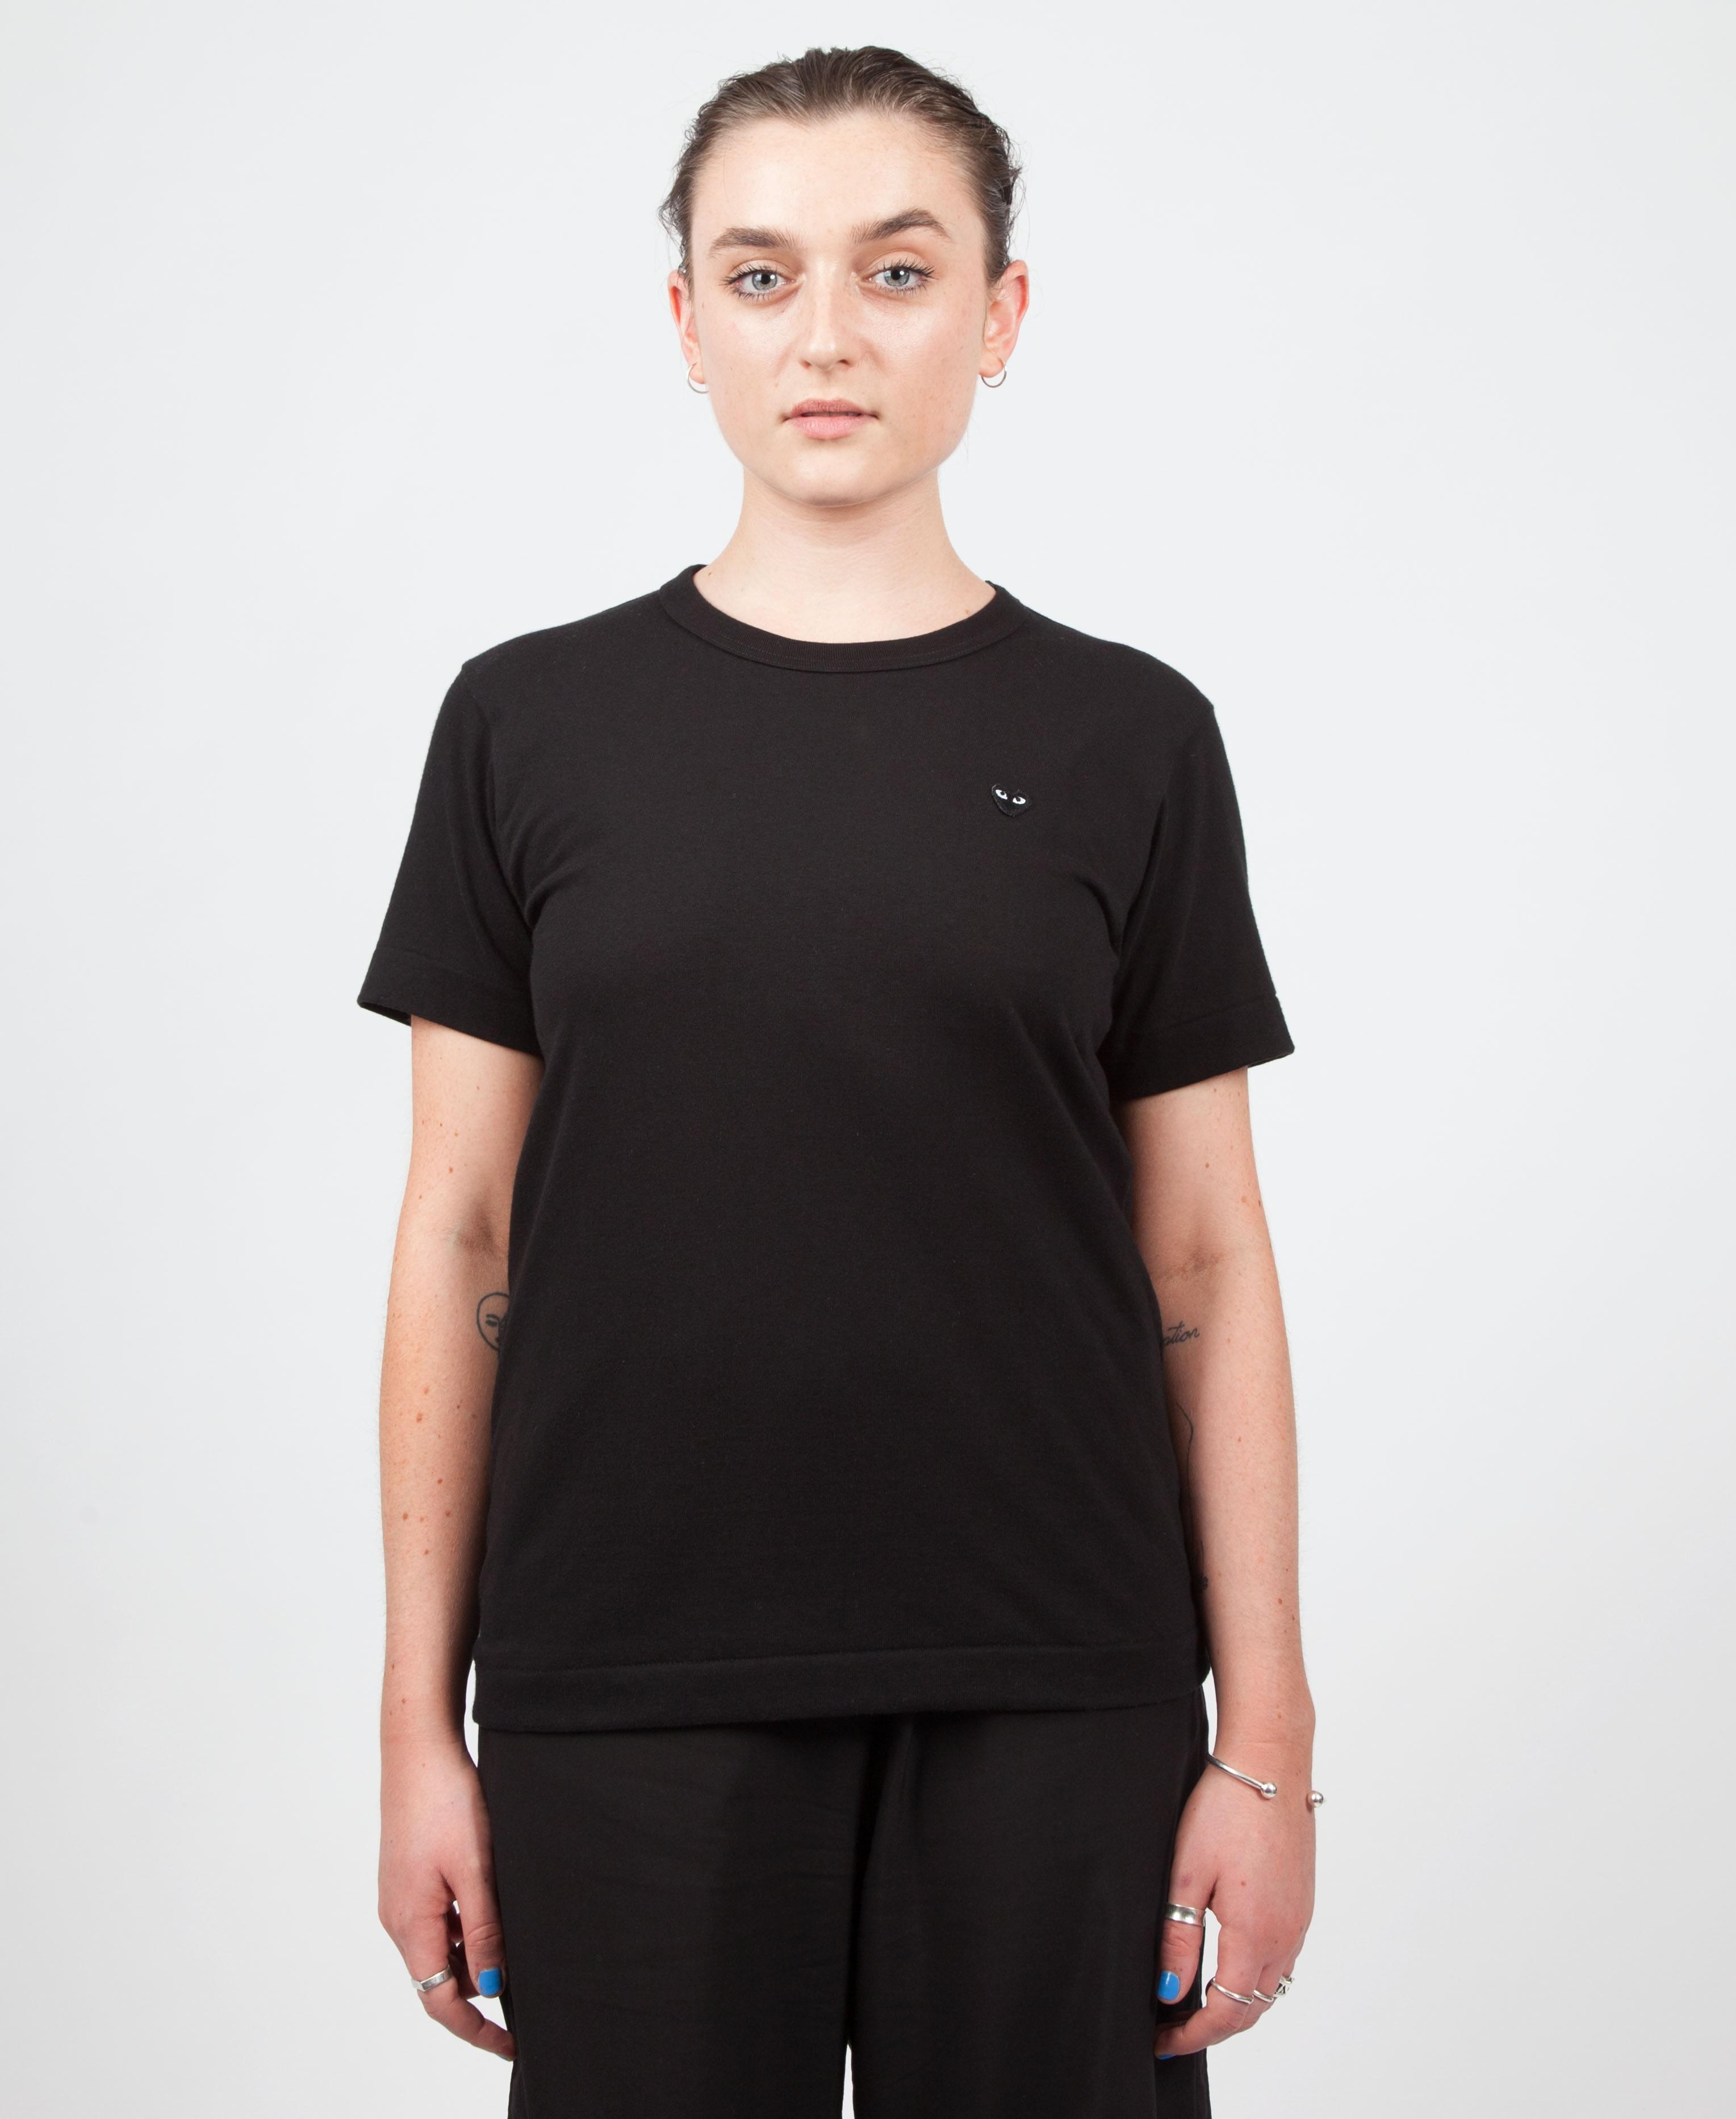 5274fd4e45c3ed Trouva  Womens Play T Shirt With Small Black Heart